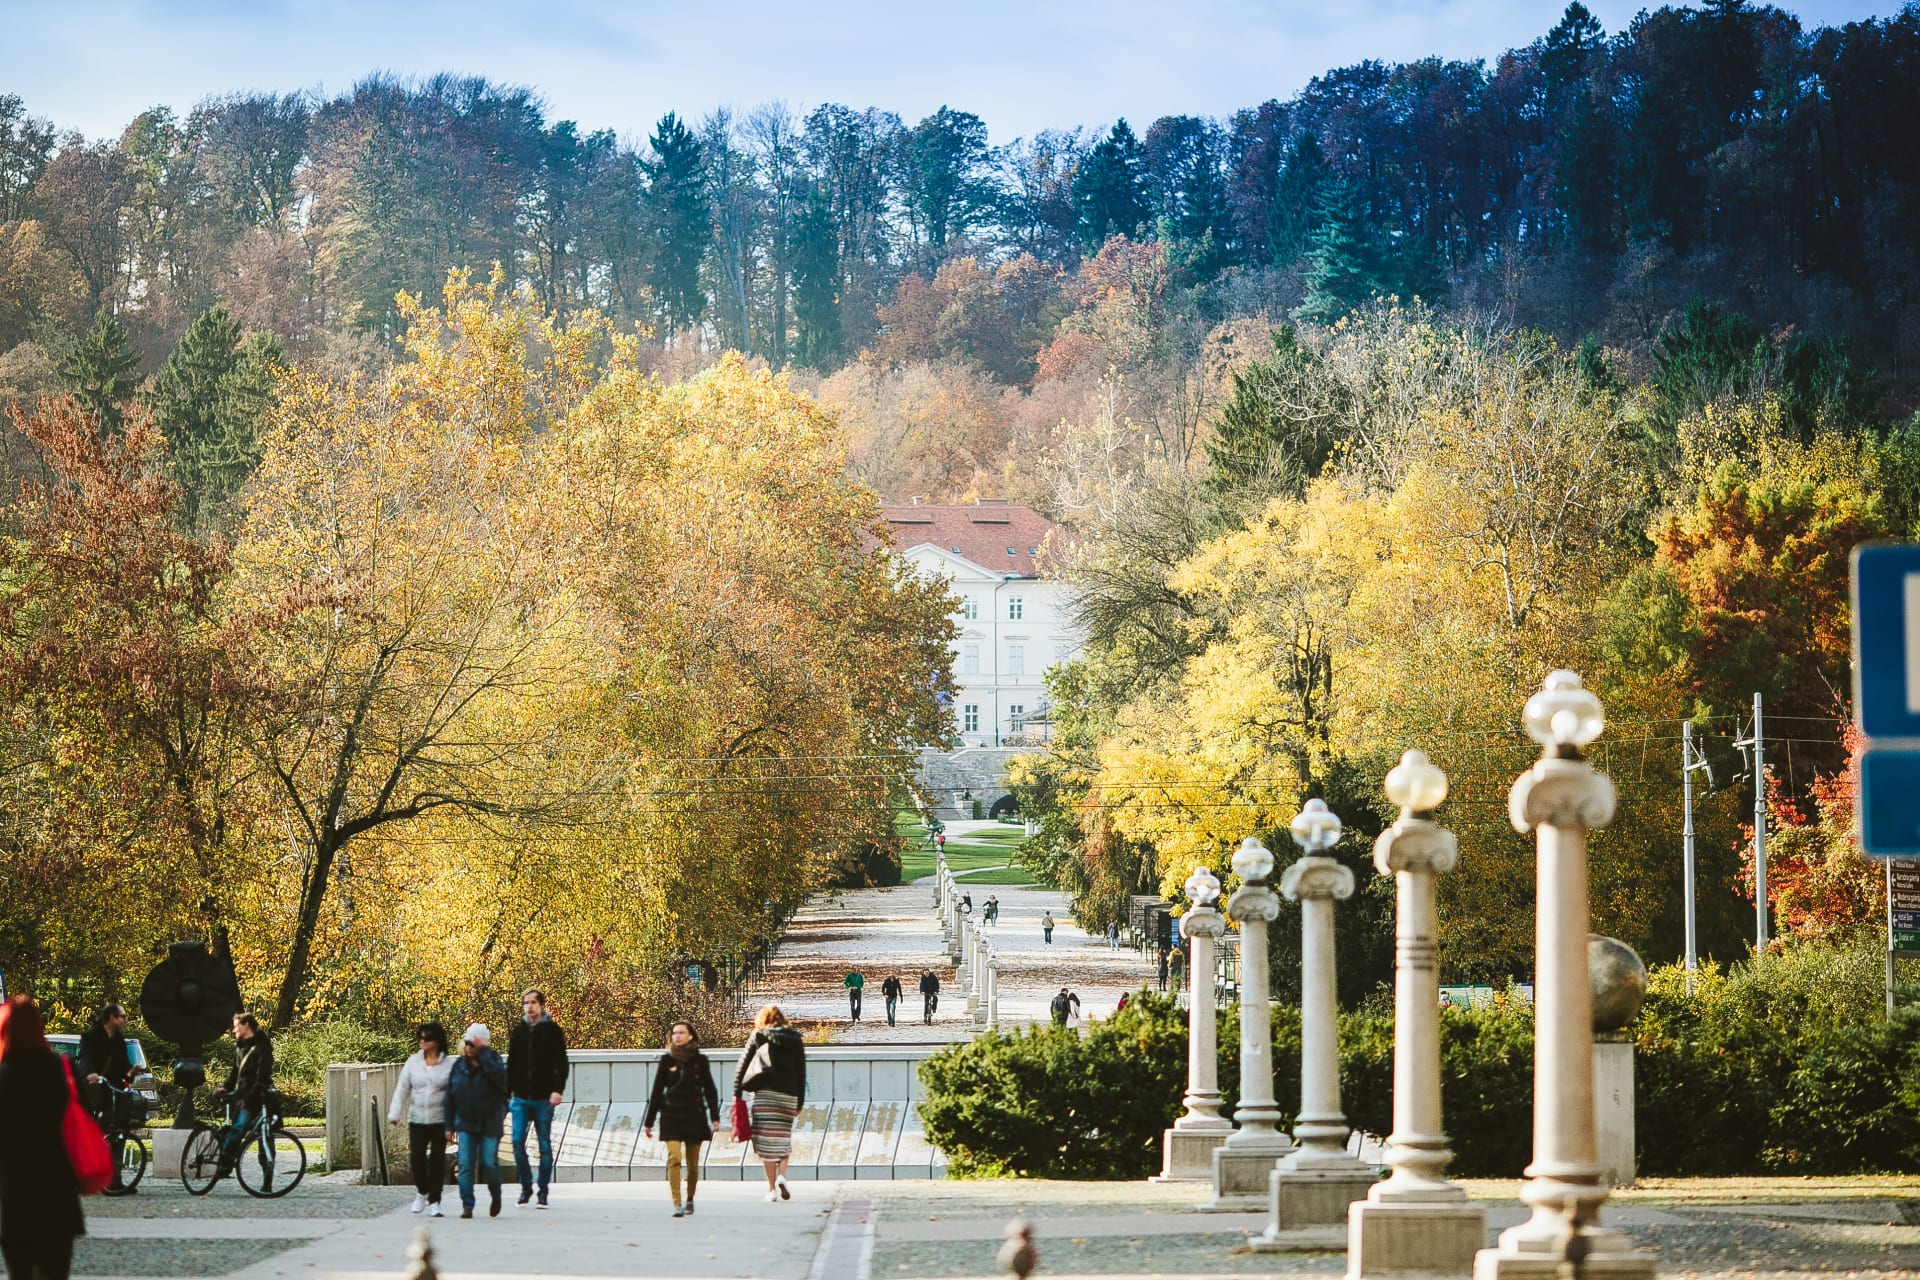 Ljubljana - Let's go for a walk- Tivoli Park is inviting us